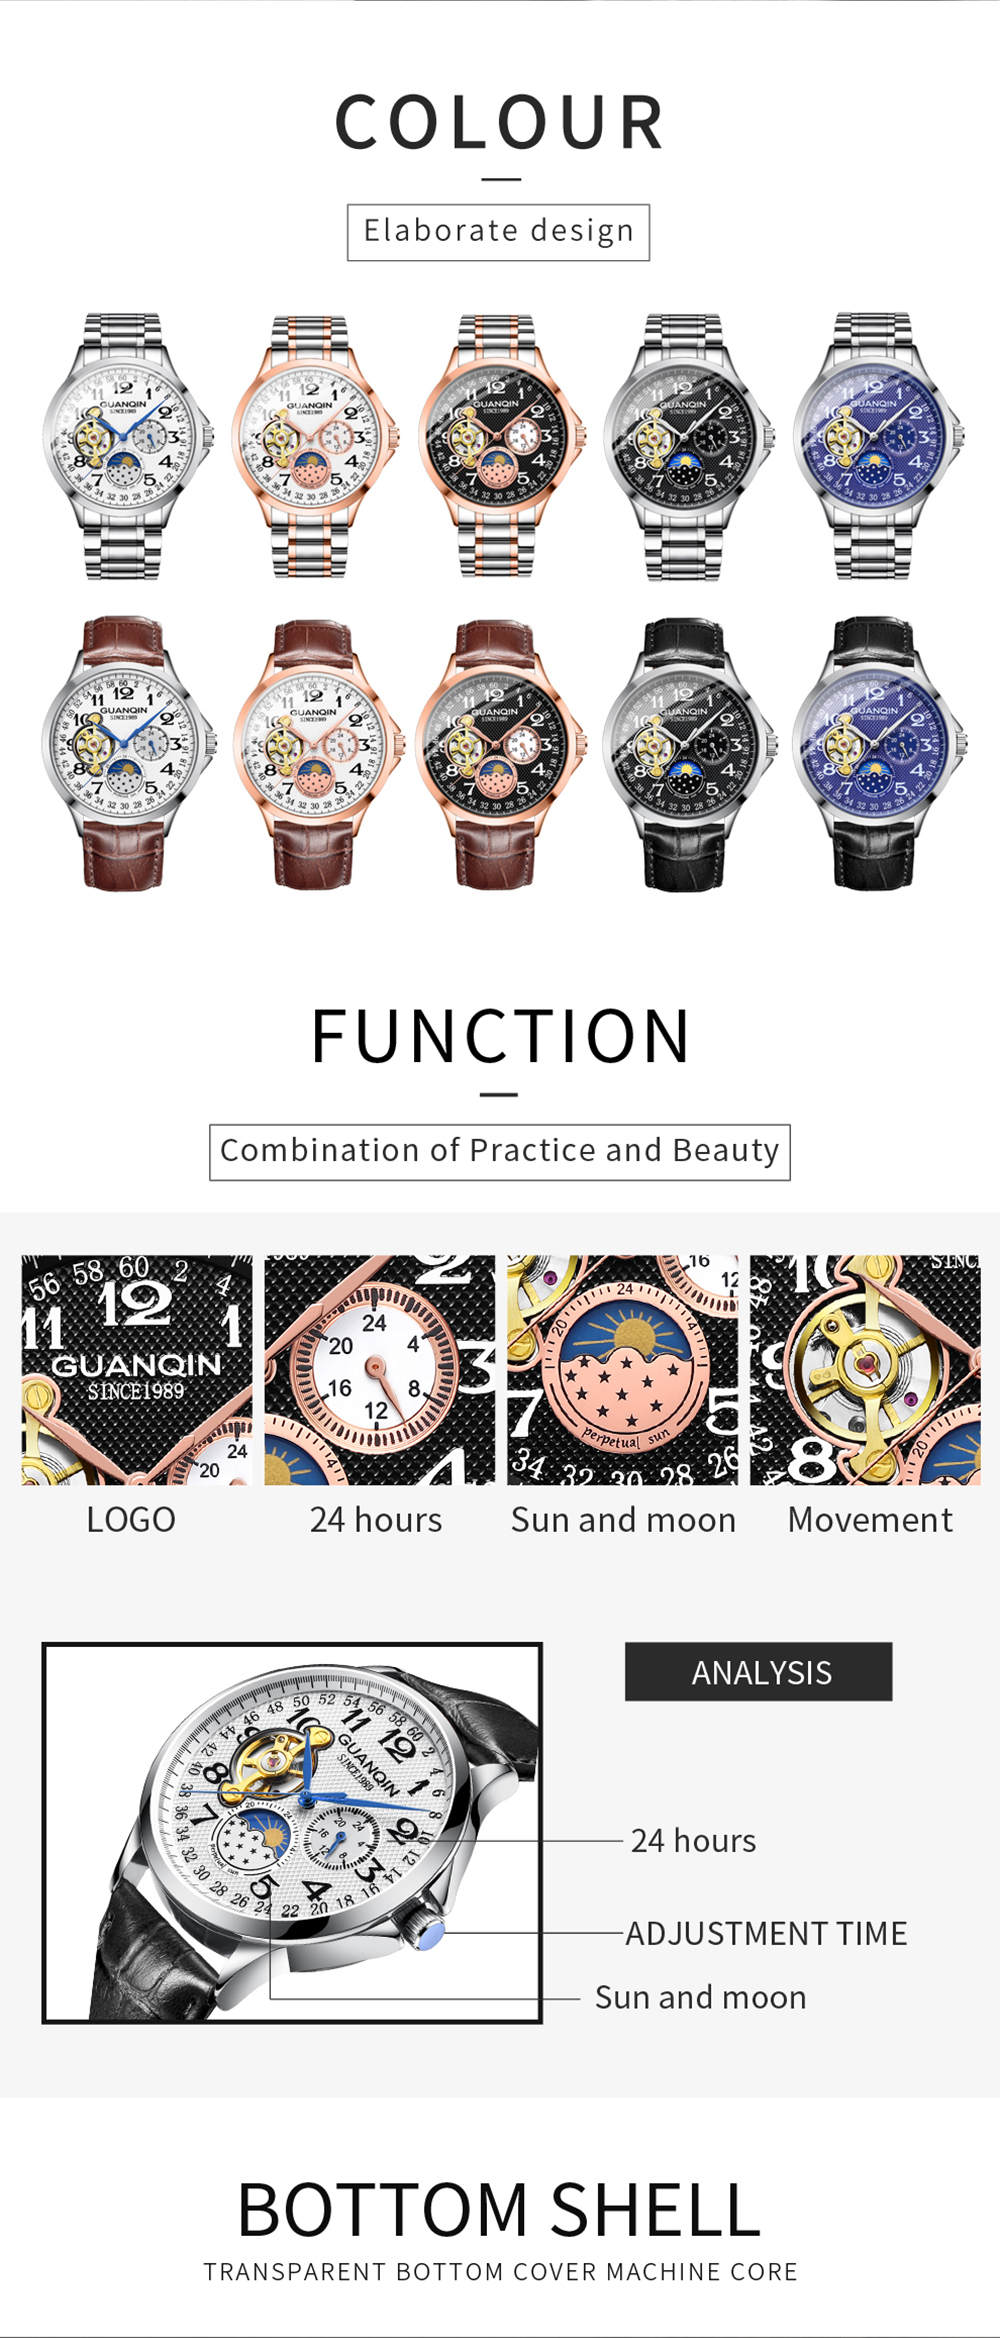 HTB1O7qtalWD3KVjSZKPq6yp7FXaM 2019 Fashion GUANQIN Mens Watches Top Brand Luxury Skeleton Watch Men Sport Leather Tourbillon Automatic Mechanical Wristwatch